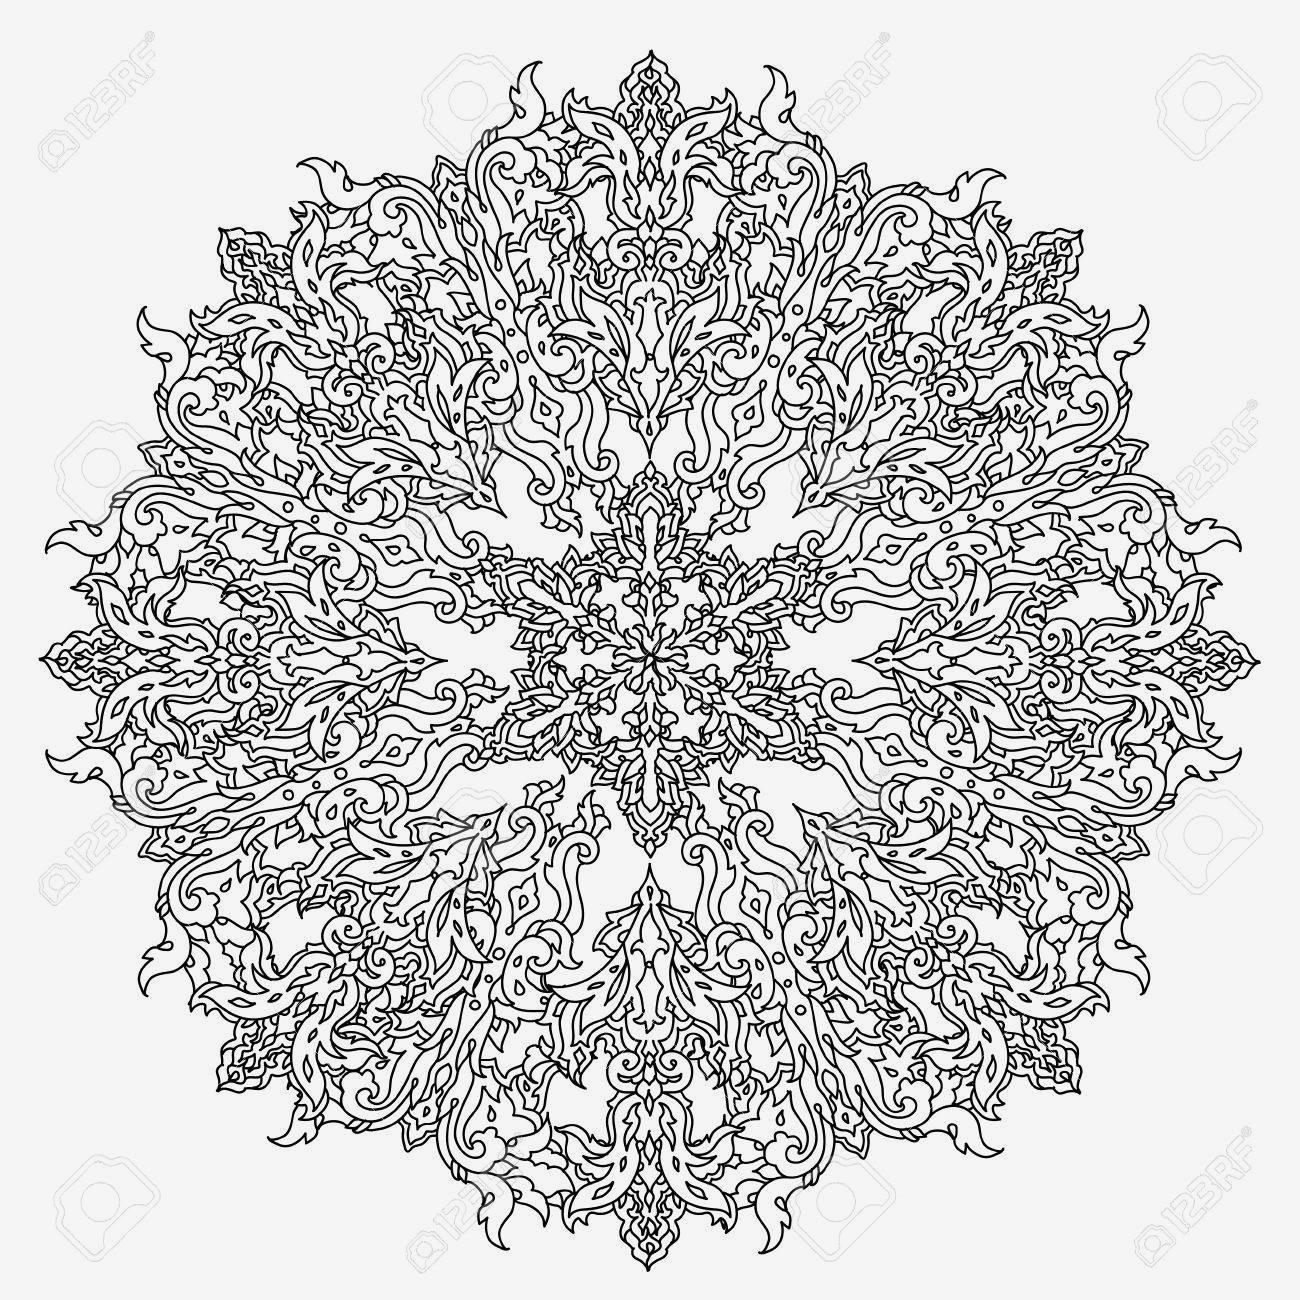 Herz Mandalas Zum Ausmalen Inspirierend Bildergalerie & Bilder Zum Ausmalen Mandala Zum Ausmalen Bilder